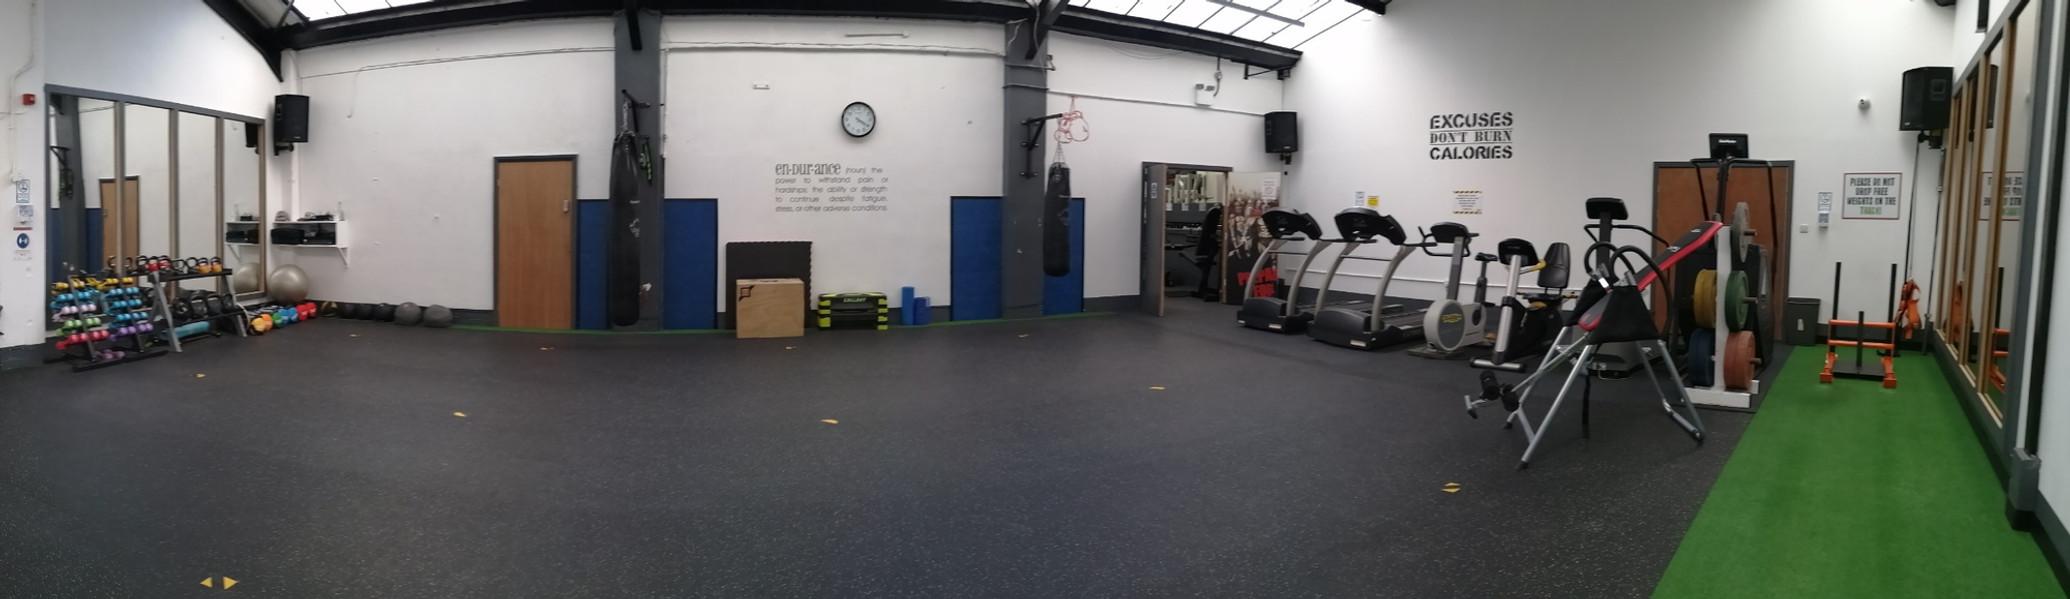 fitness room2.jpg